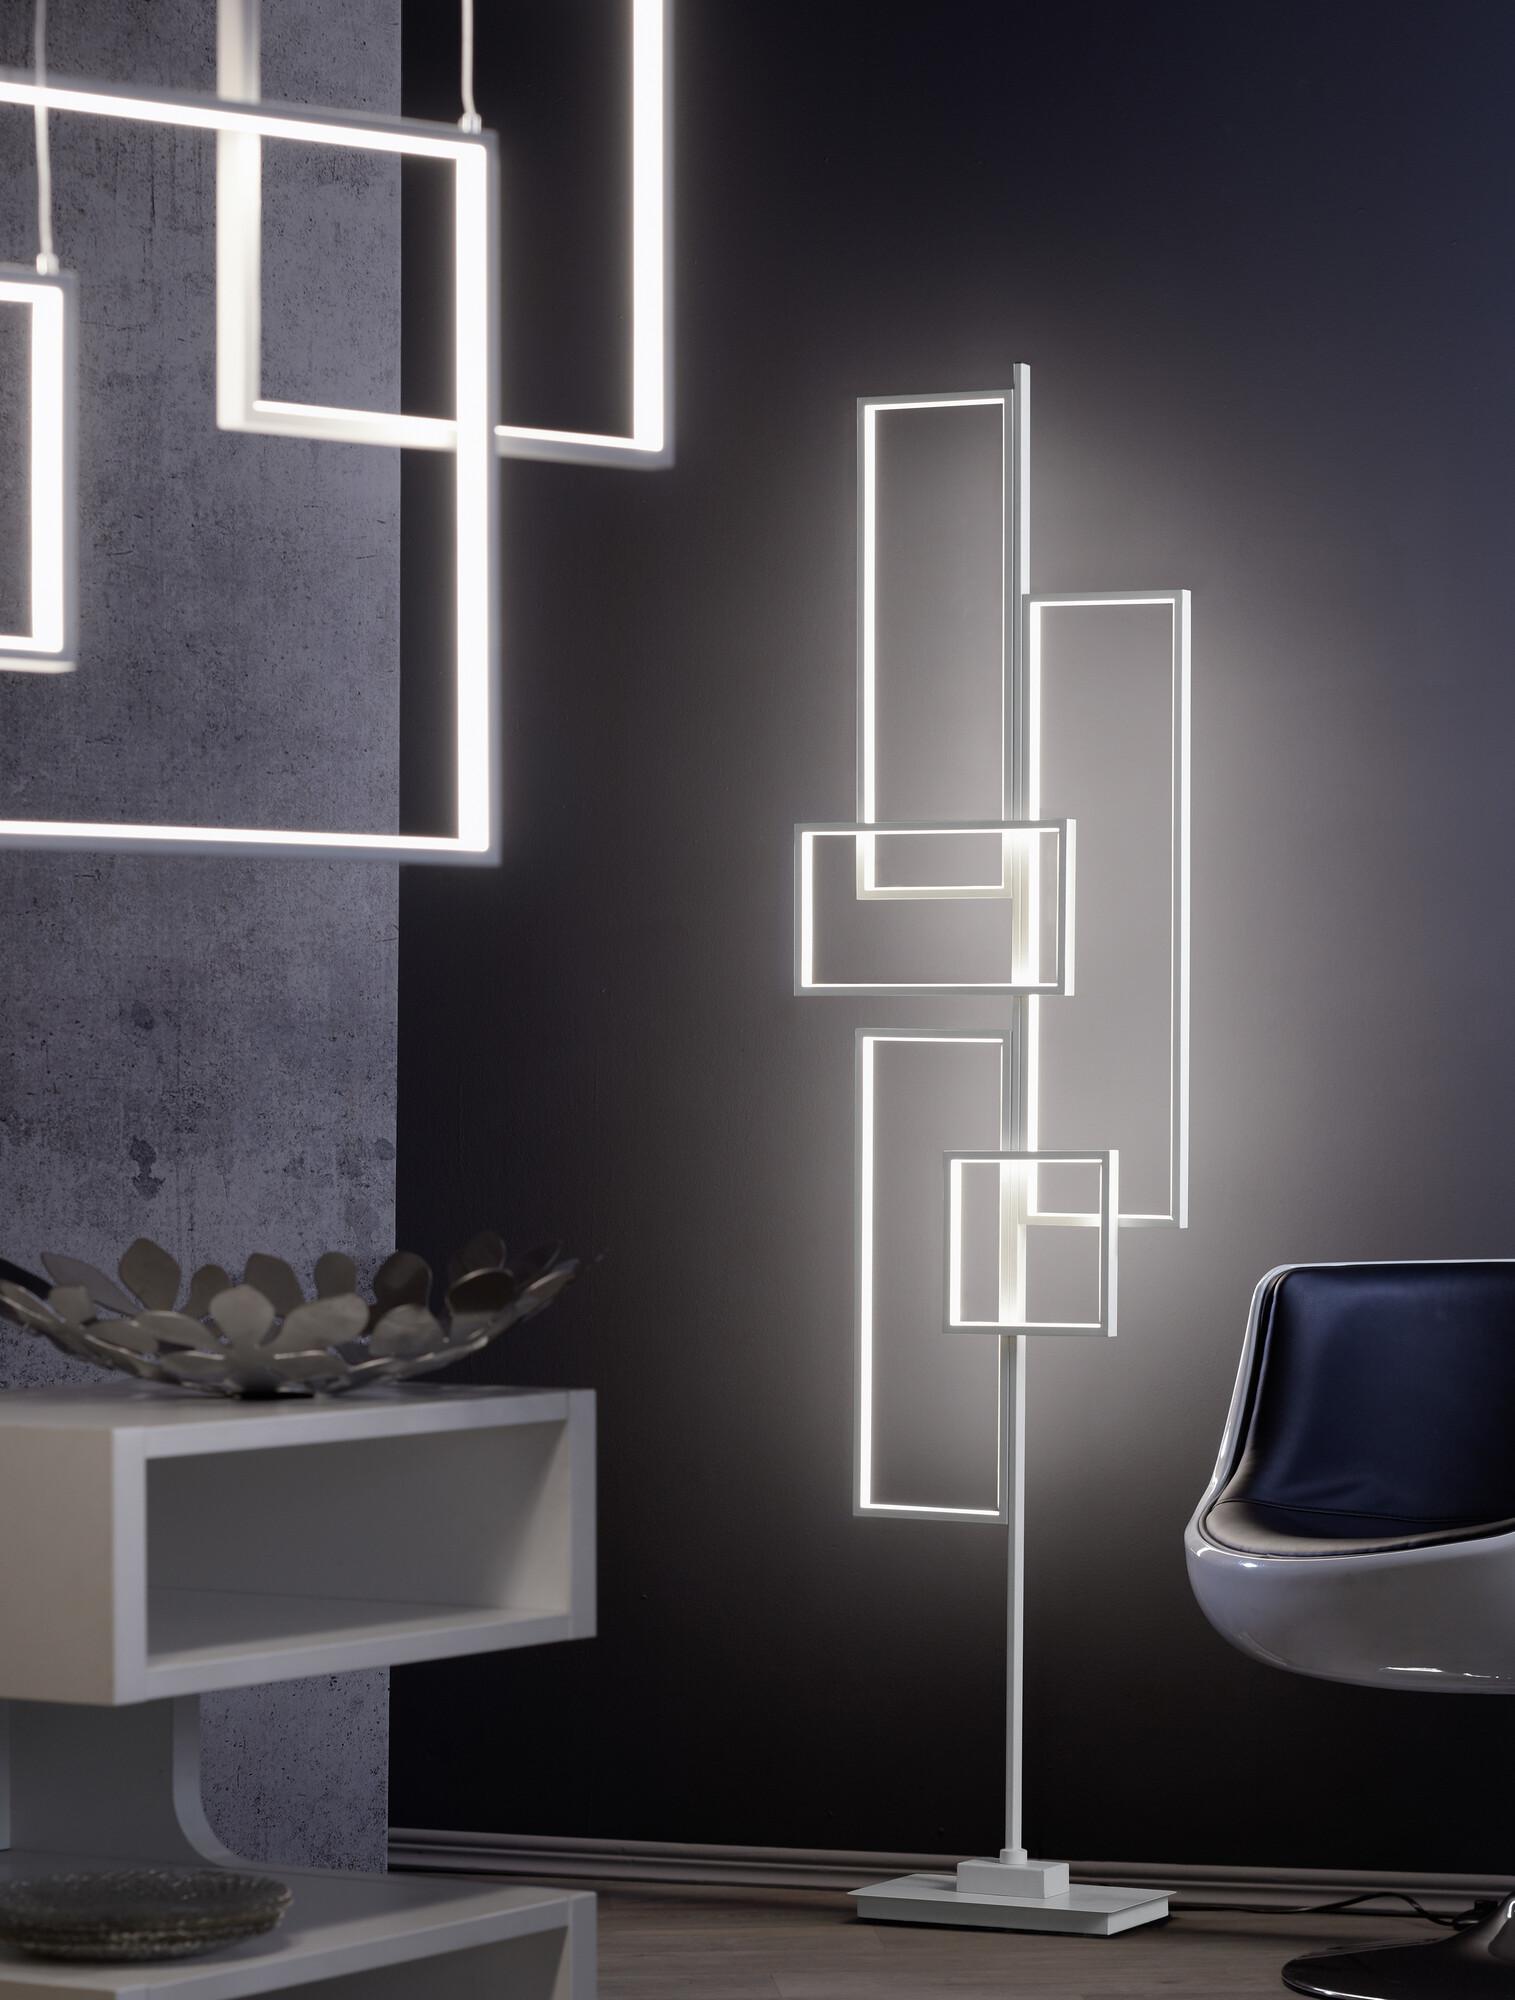 TUSCON Vloerlamp LED 1x50W/4000lm Wit